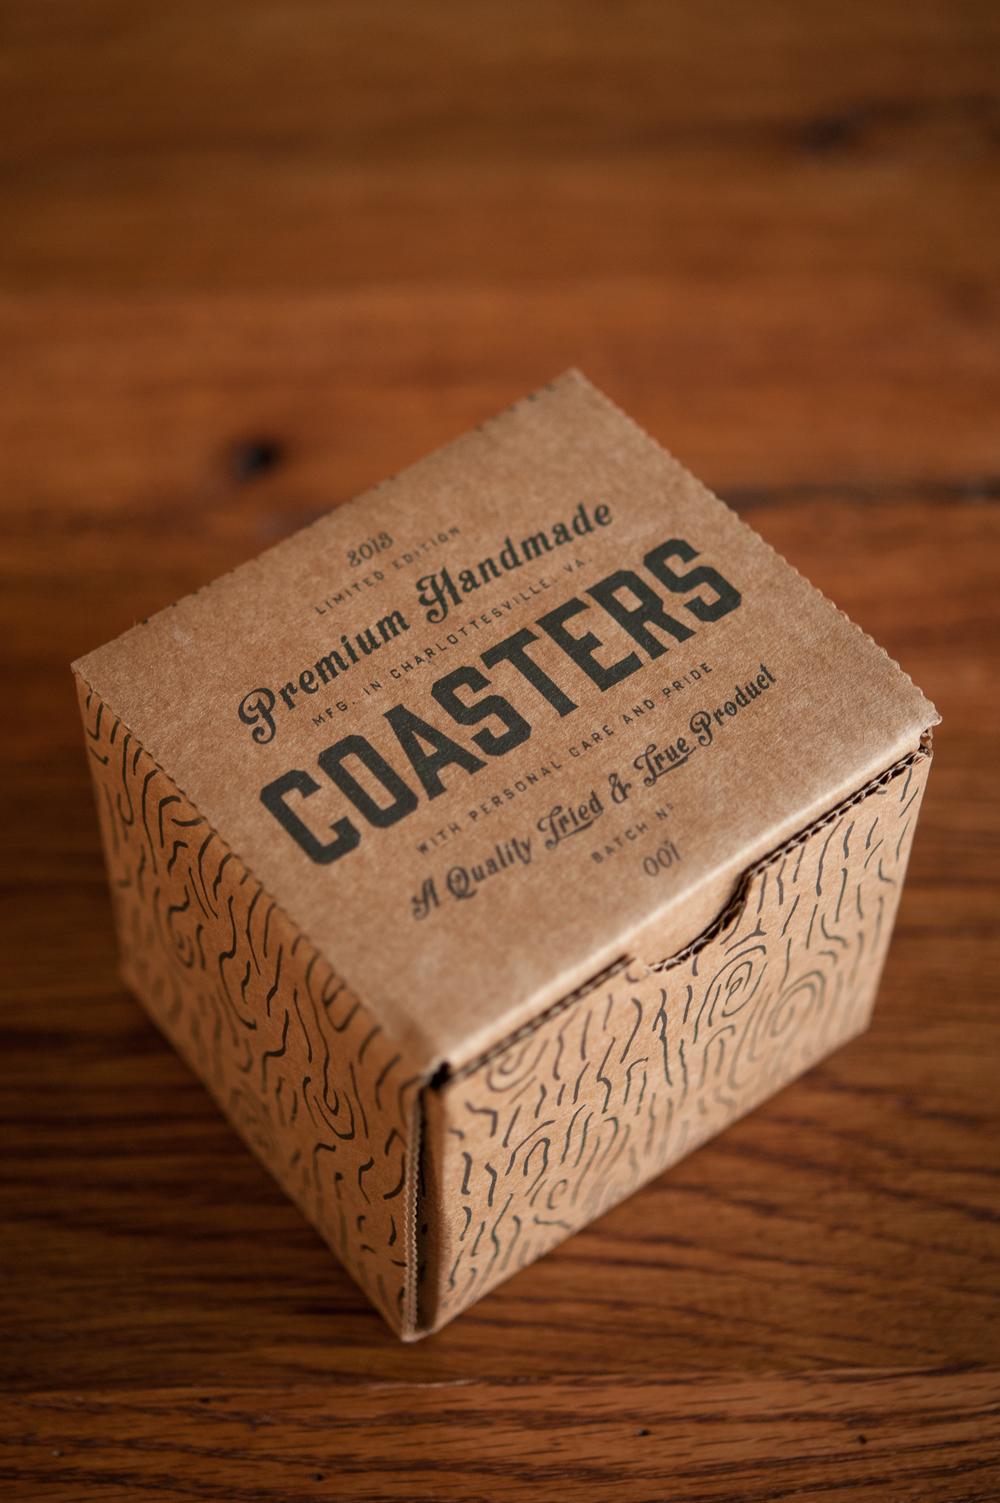 Premium Handmade Coasters The Dieline Branding